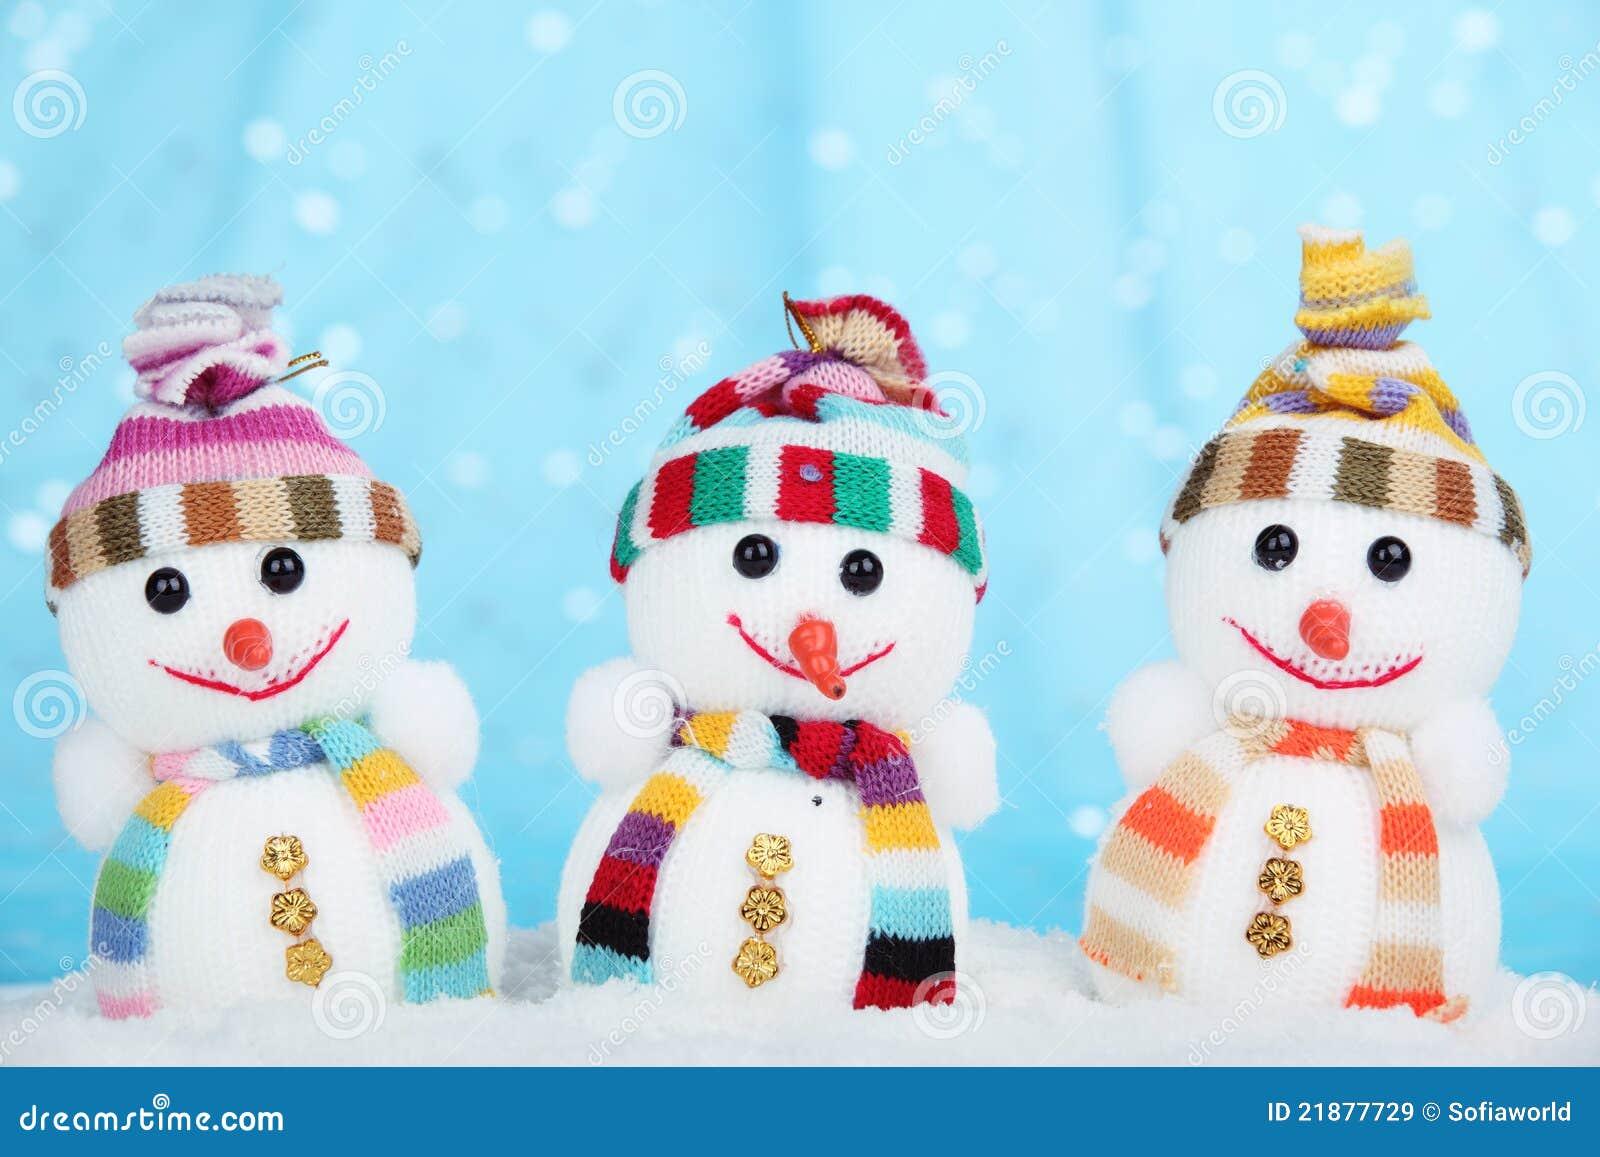 christmas snowman - Snowman Christmas